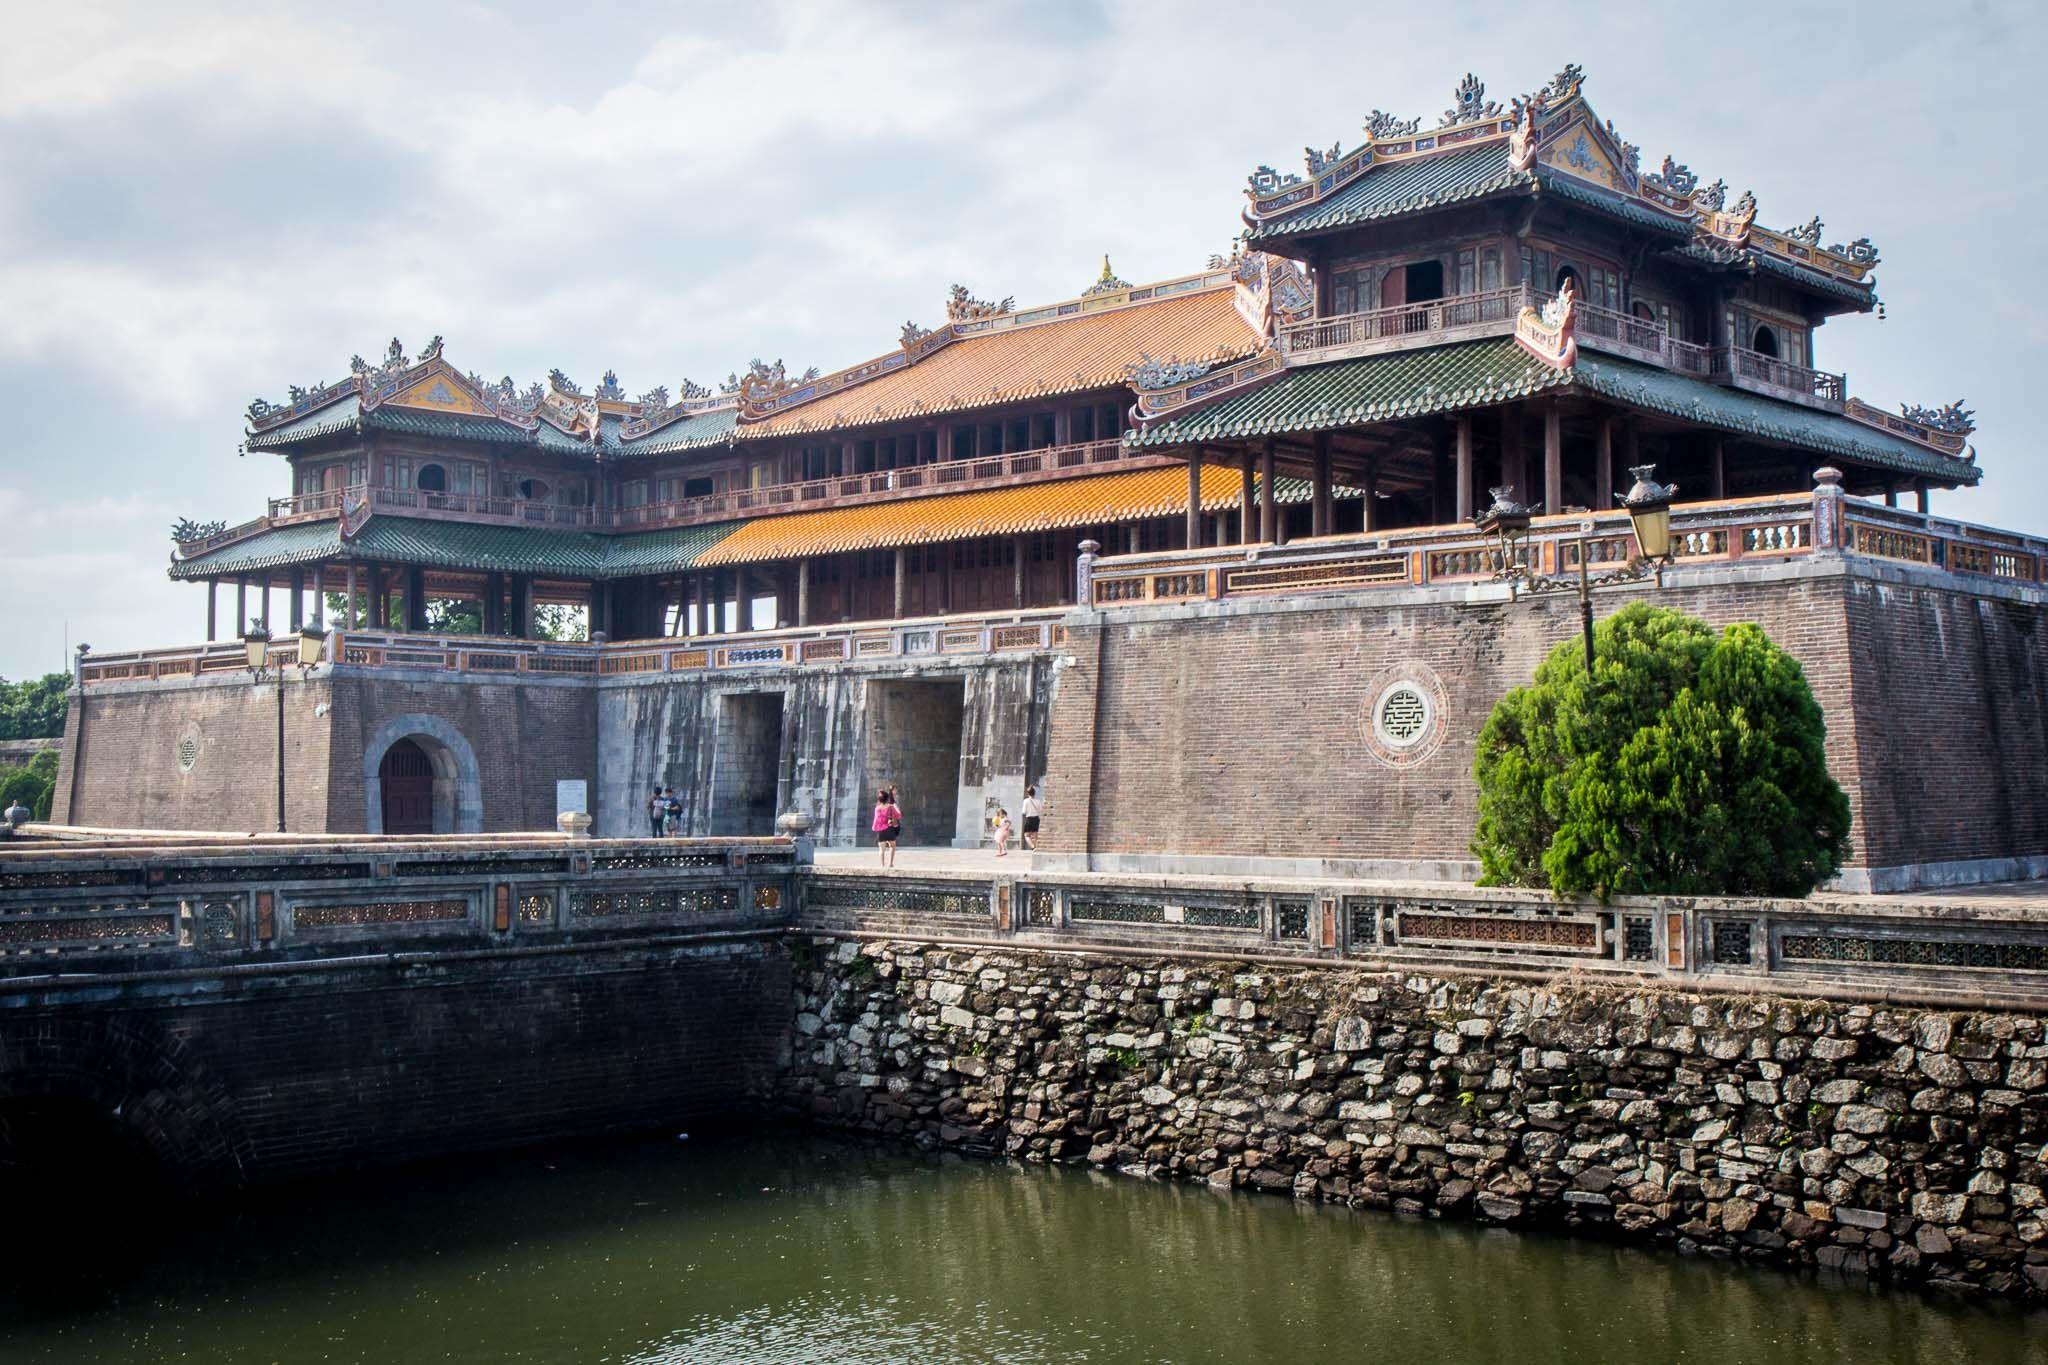 Visiting The Imperial City Of Hue The Hue Citadel Vietnam In 2020 Vietnam Purple City City